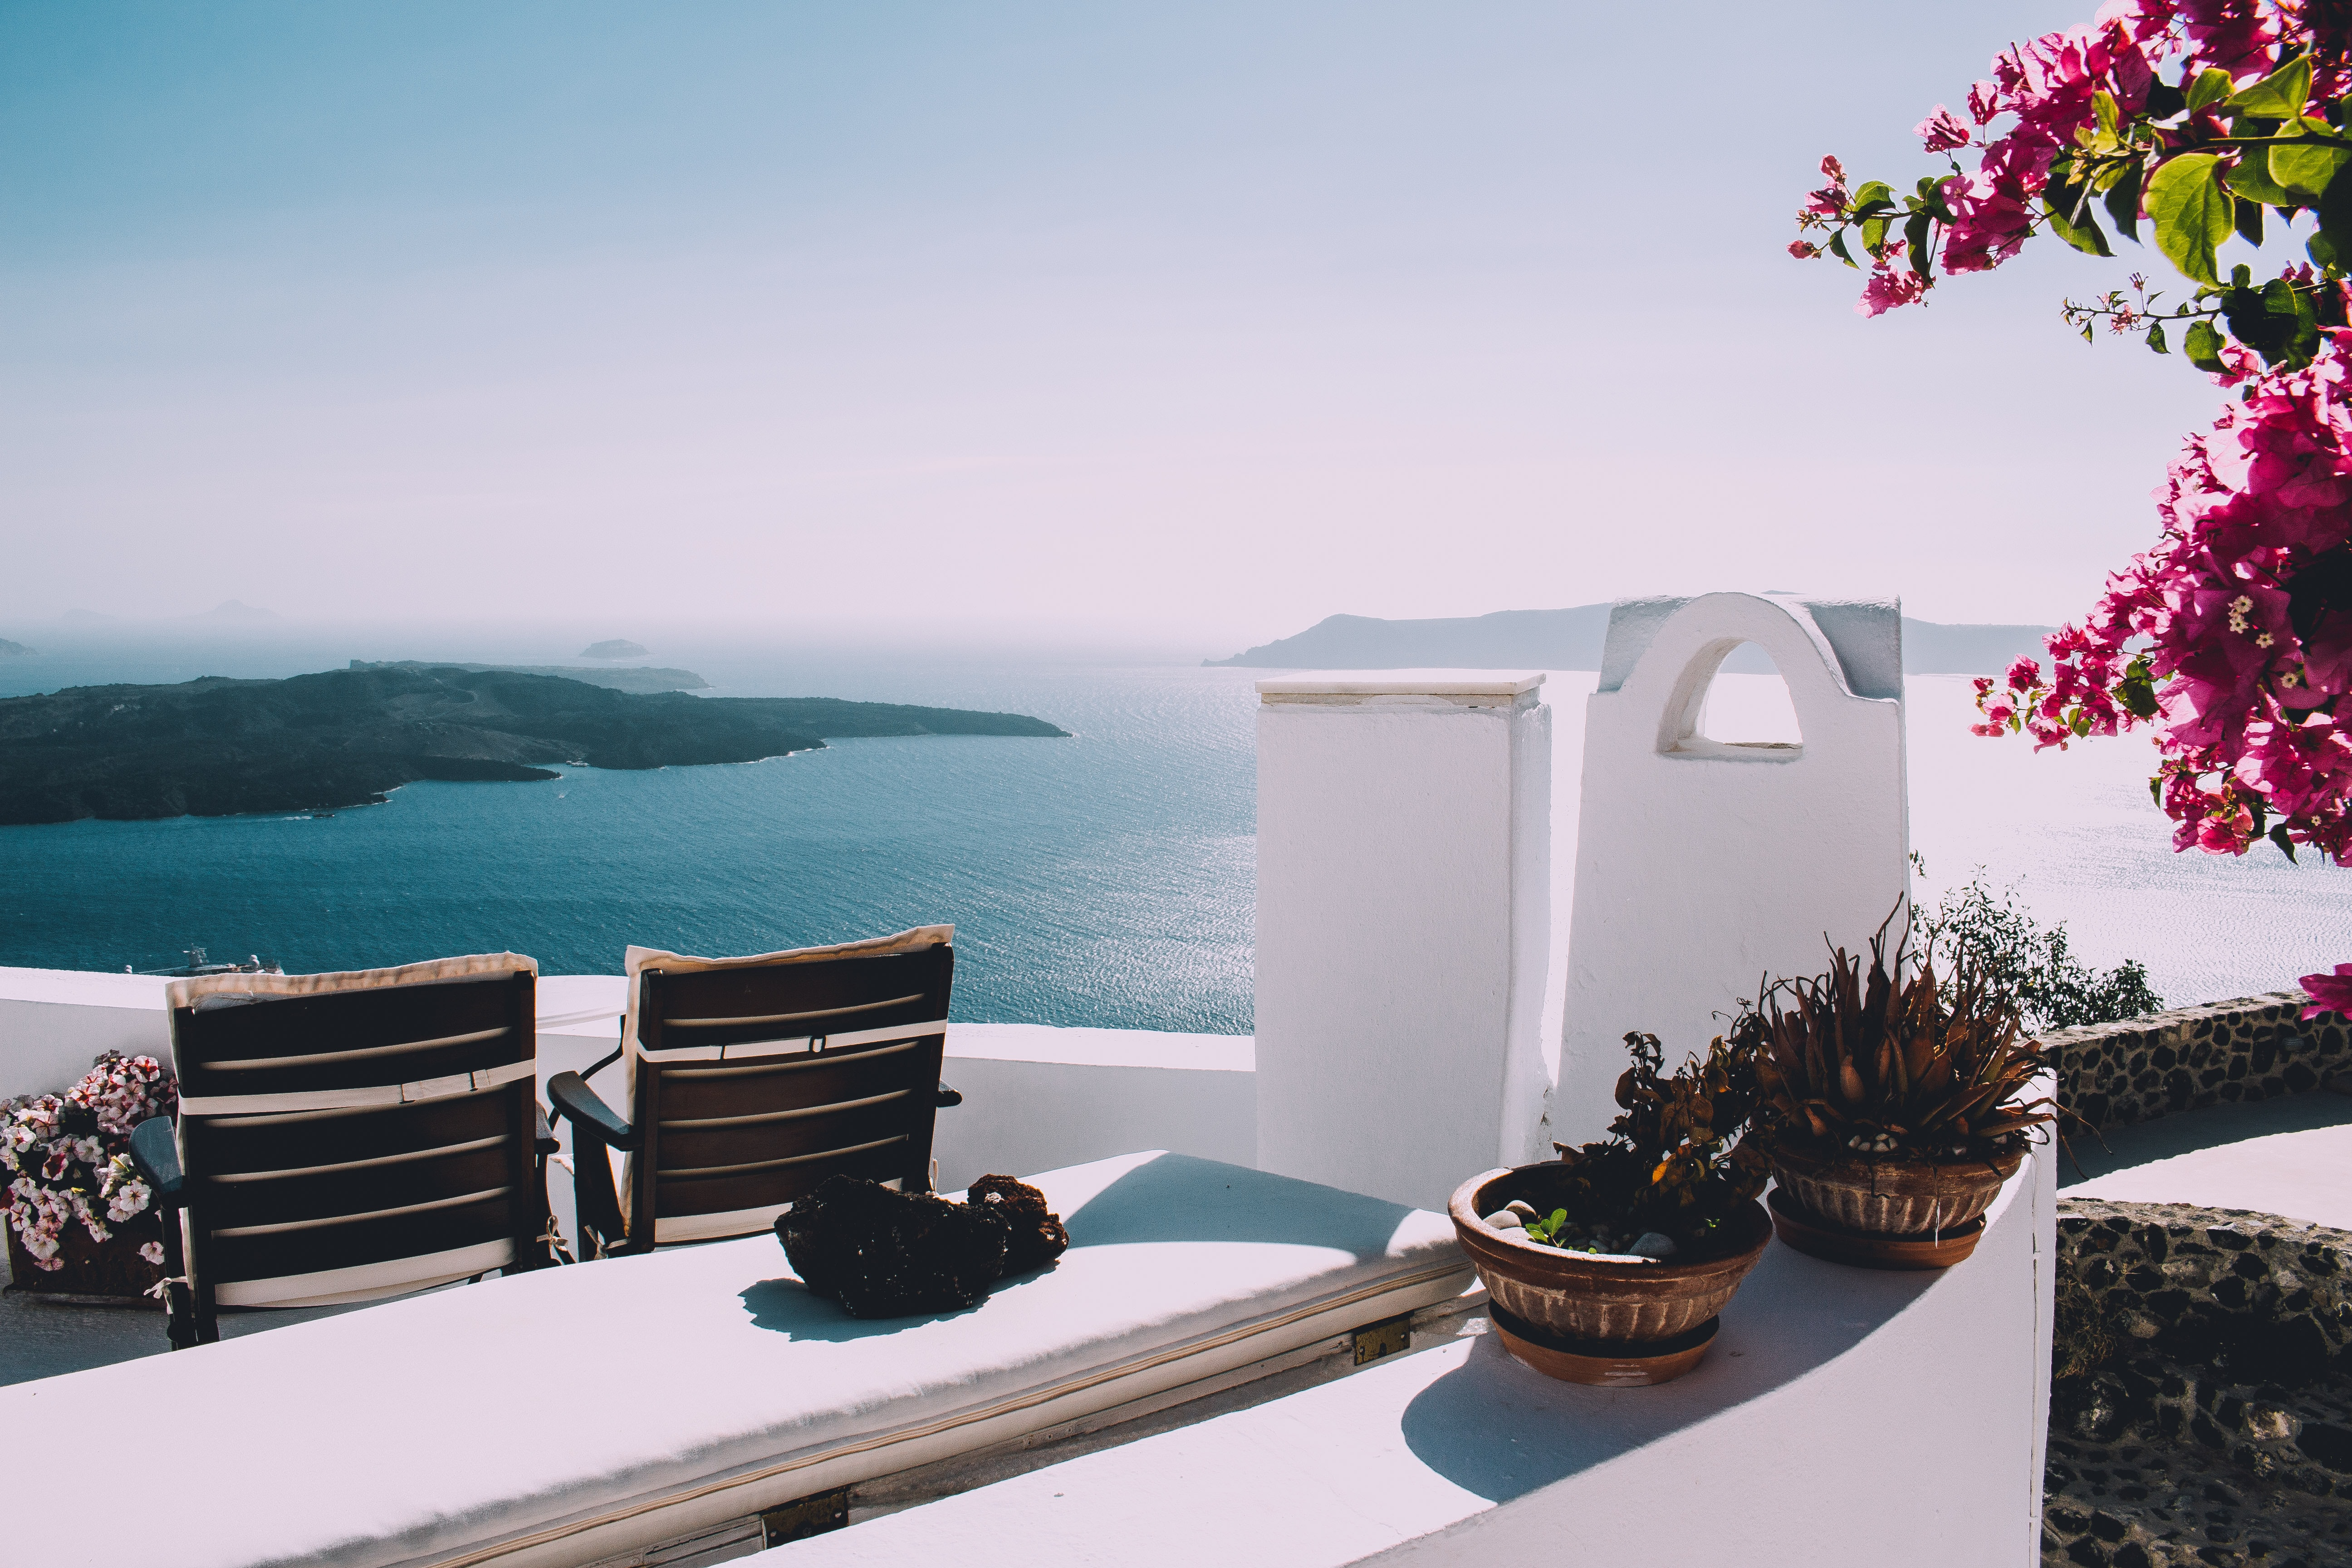 Top 10 Best Villas in Greece- The Perfect Escape